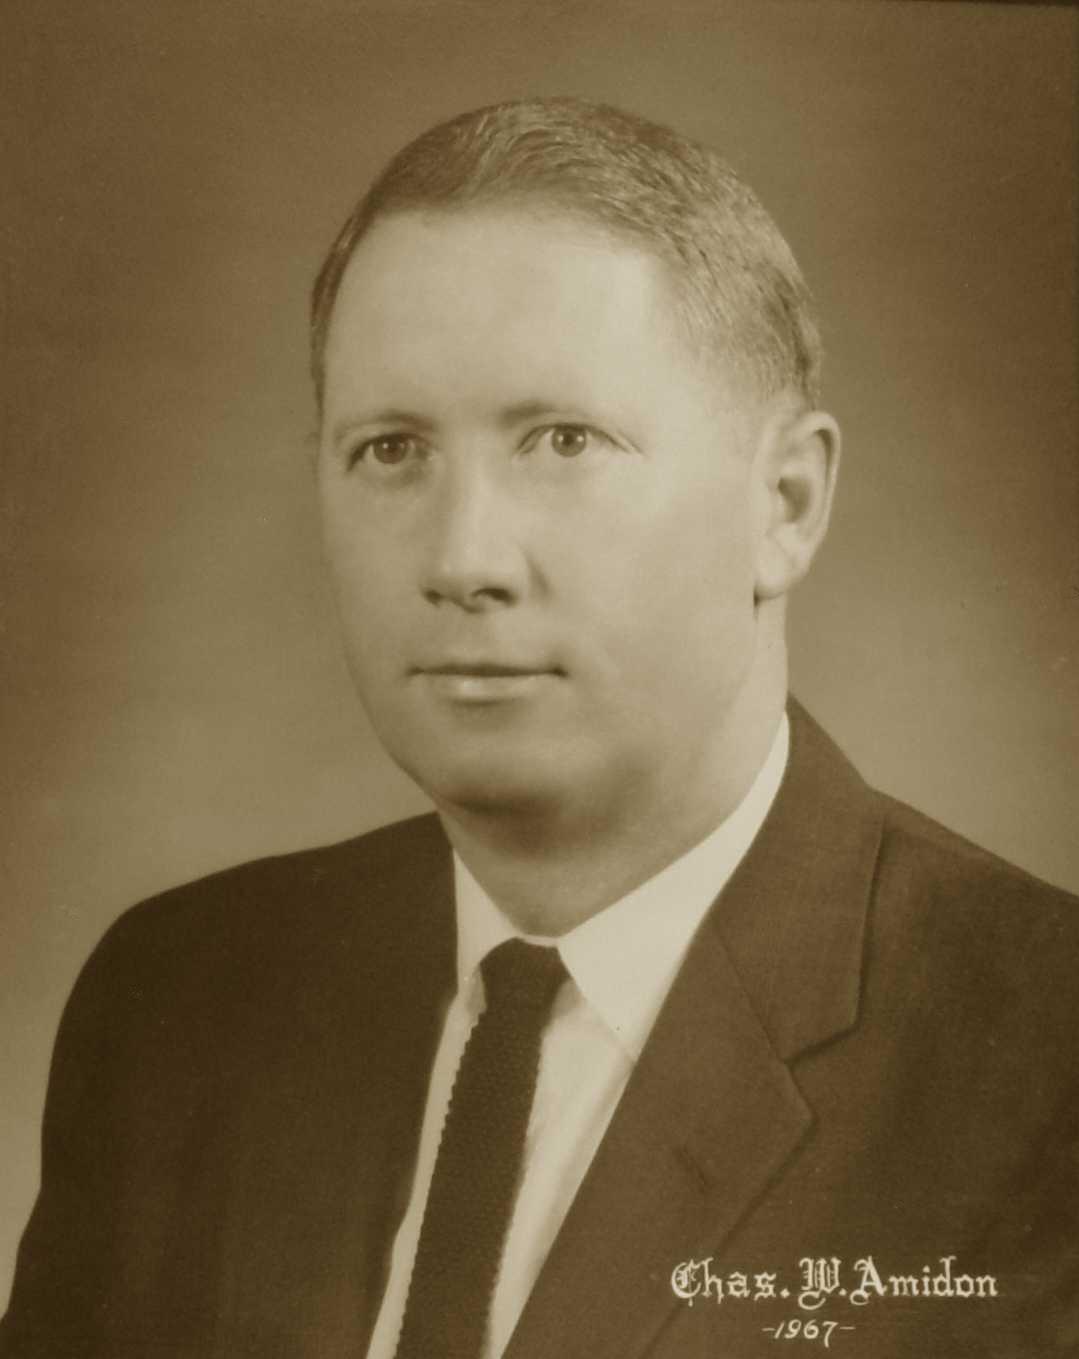 Charles W. Amidon, 1967